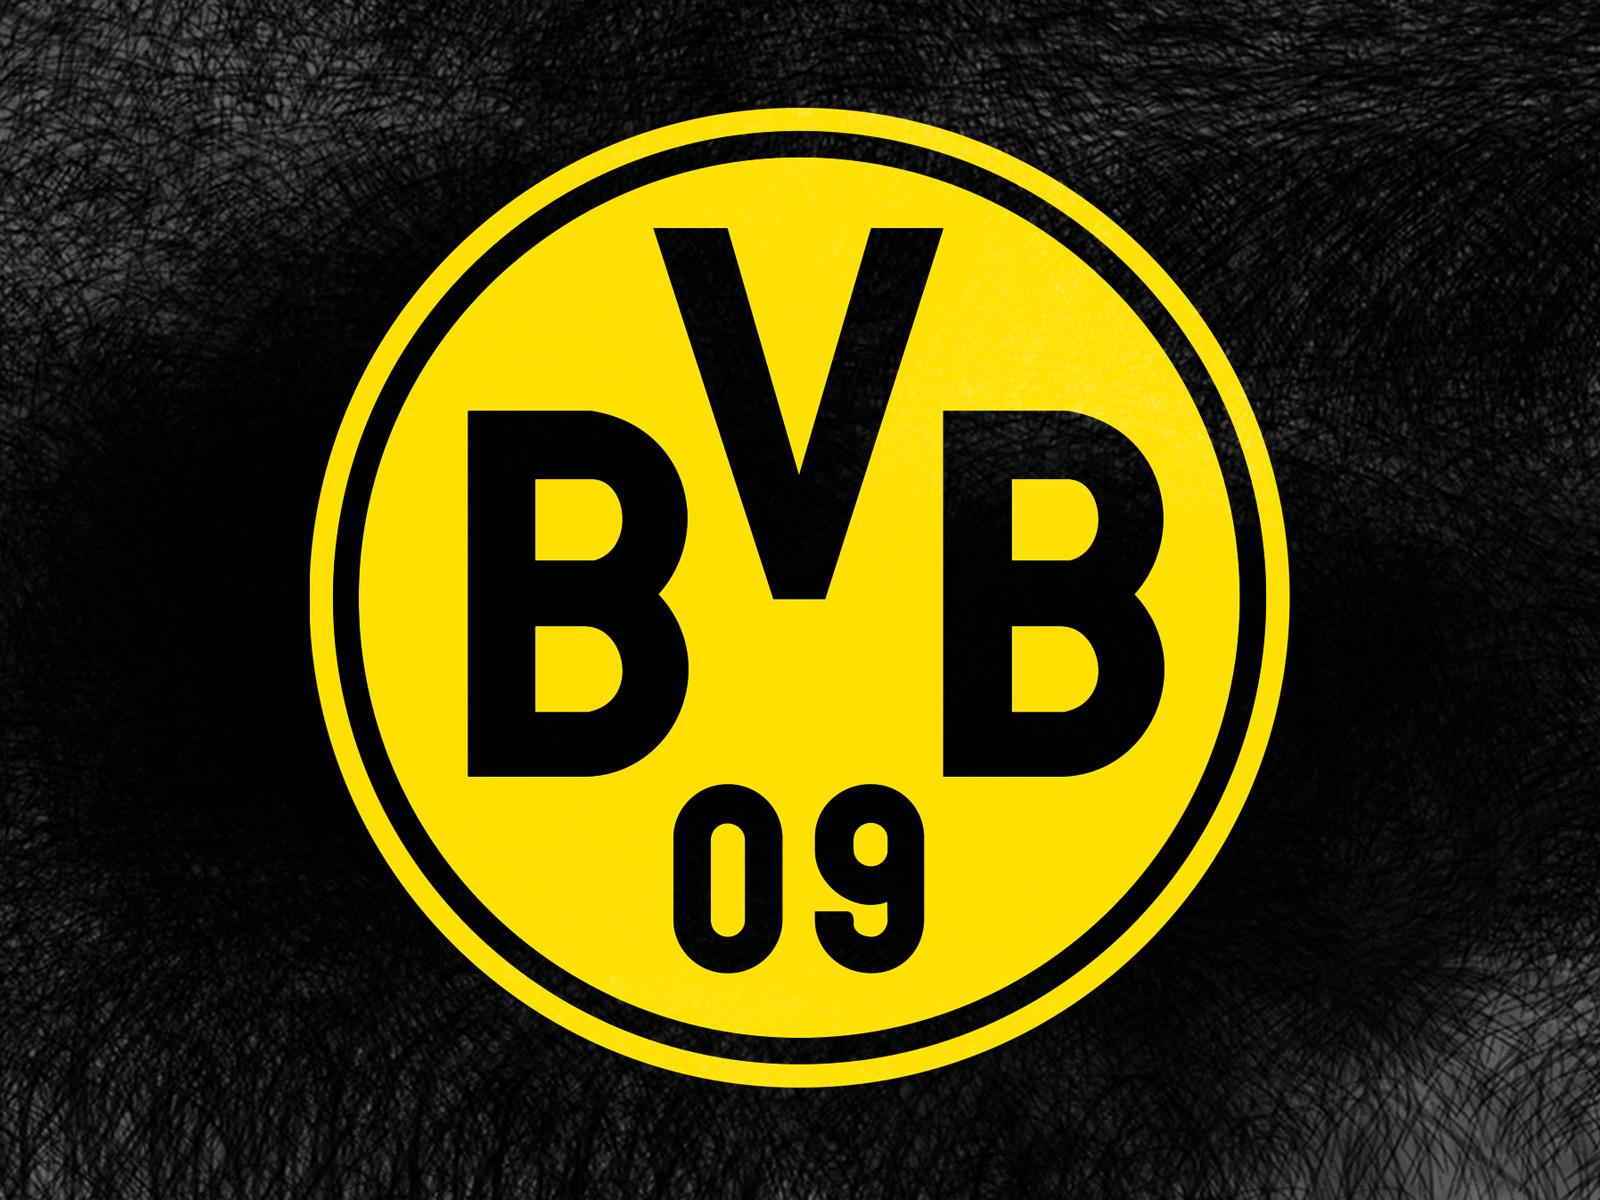 bvb whatsapp bild